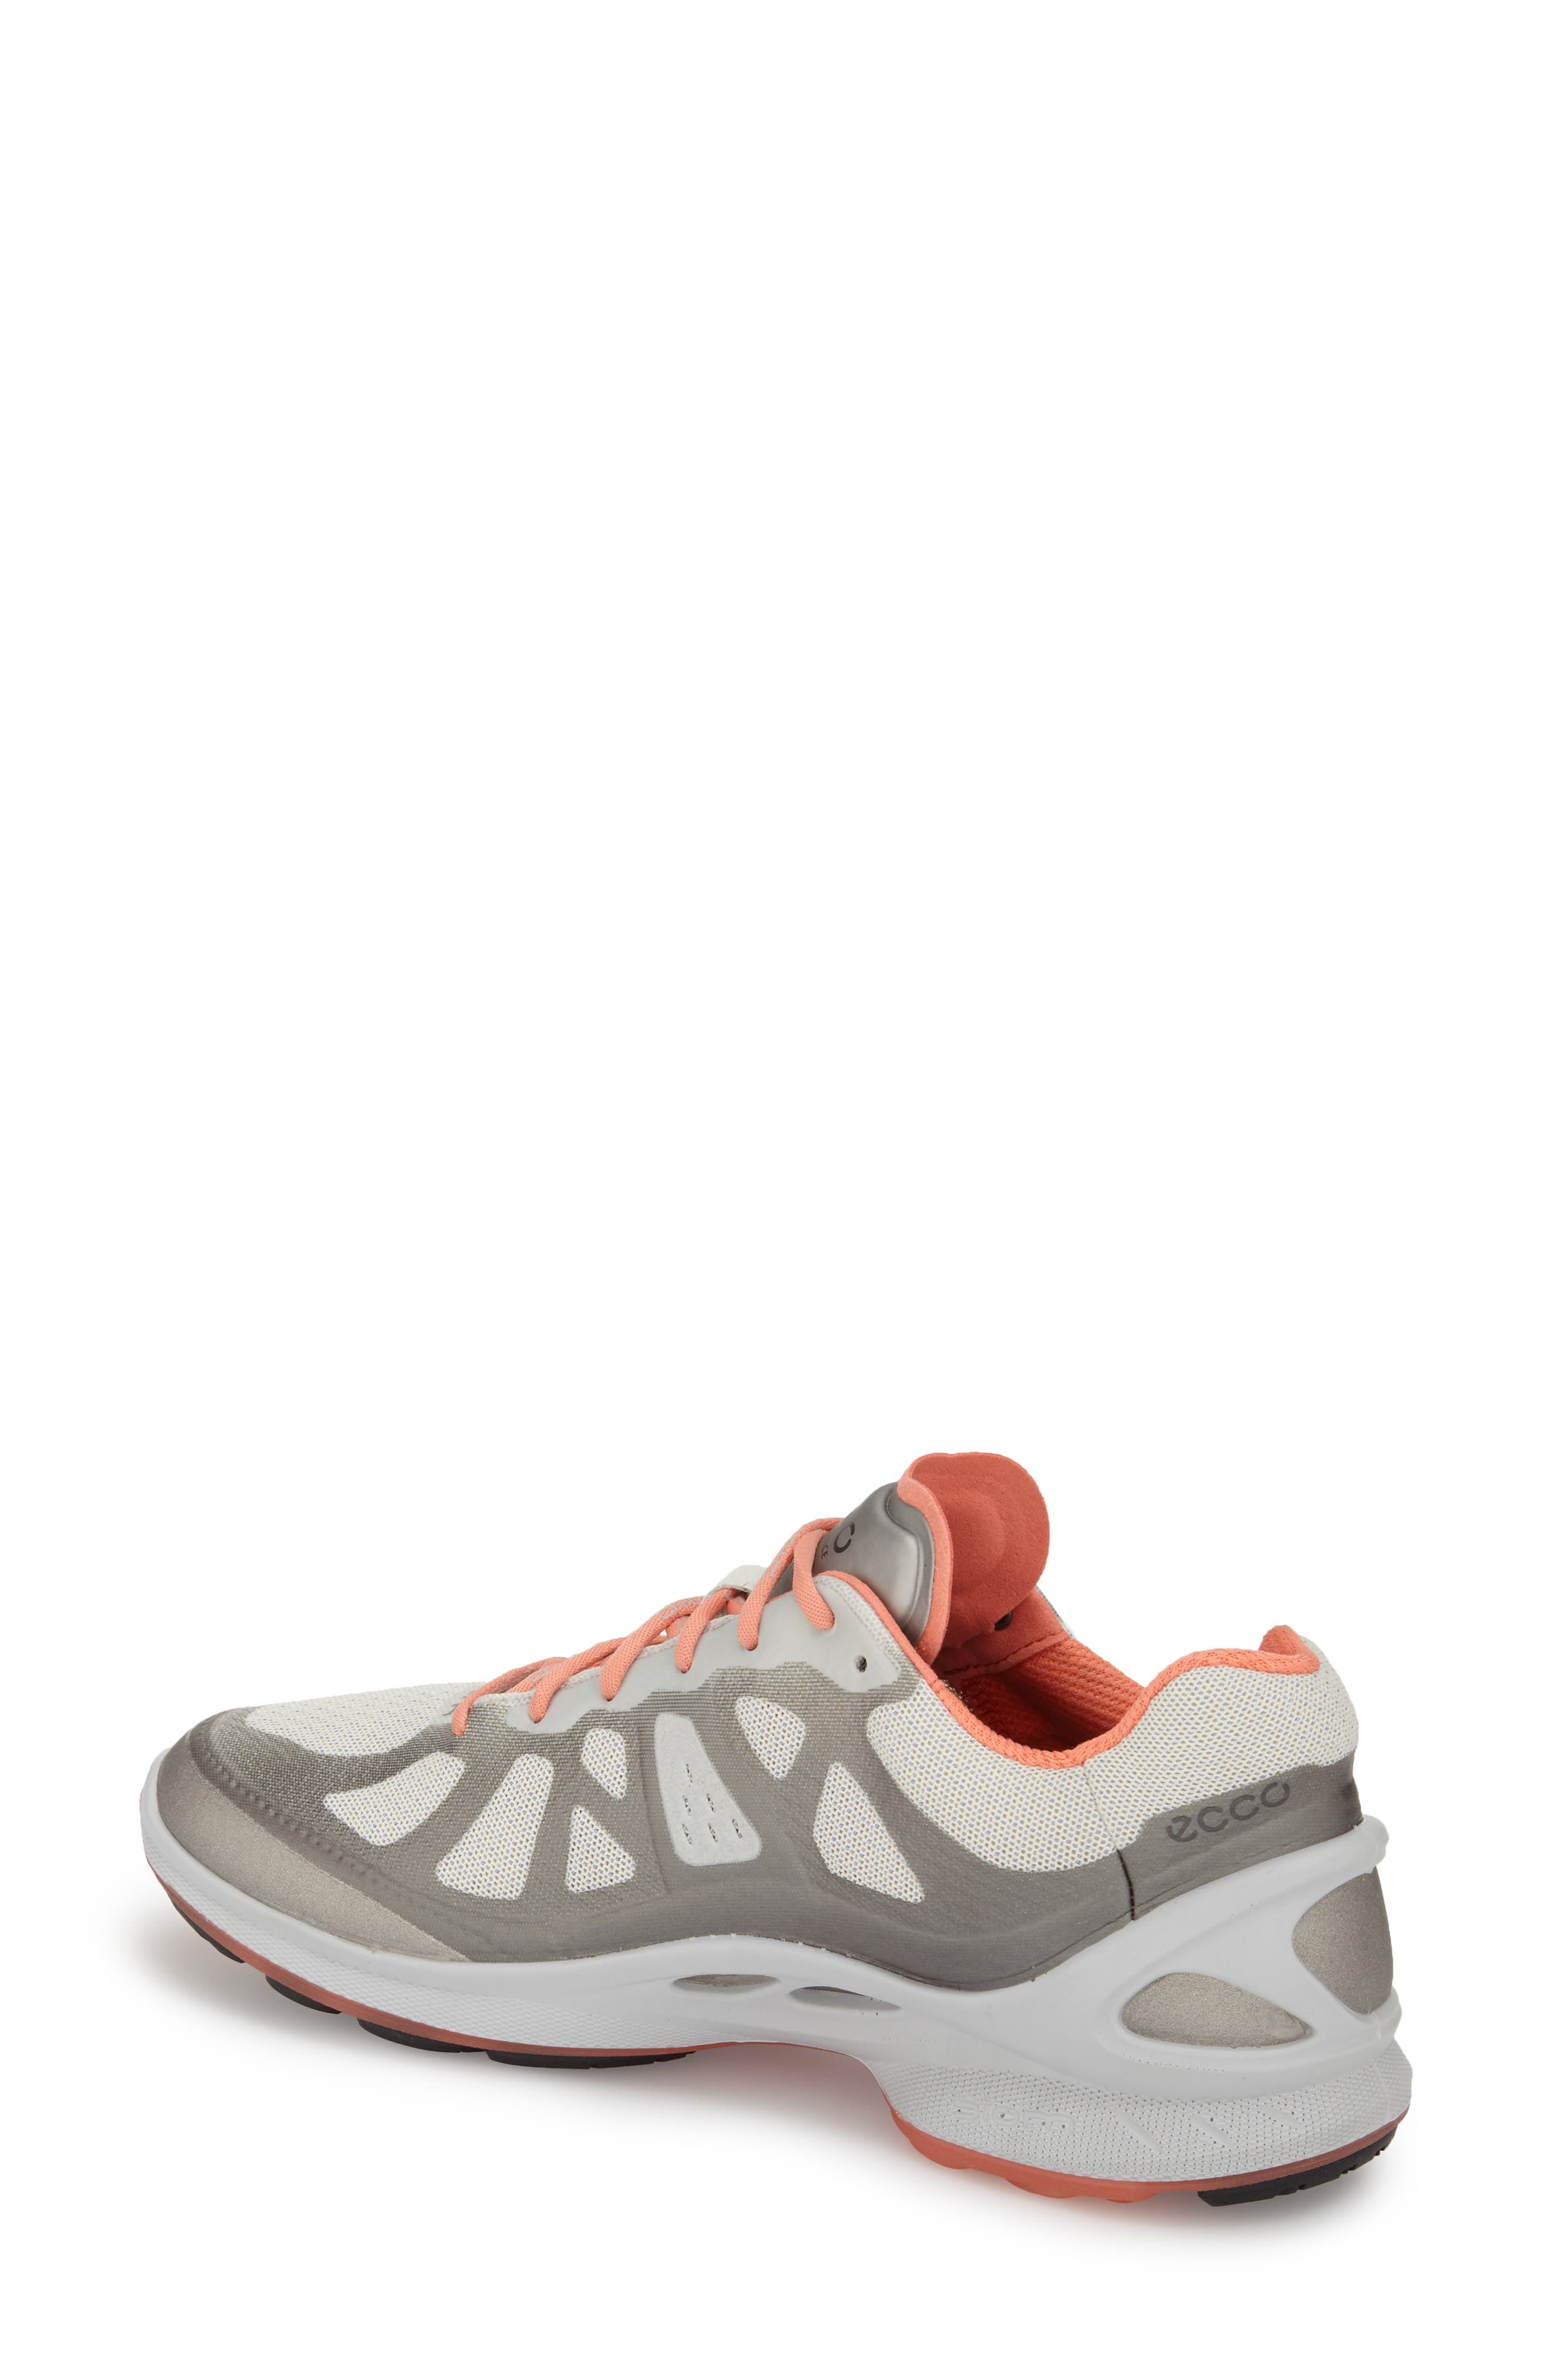 'BIOM Fjuel Racer' Sneaker,                             Alternate thumbnail 2, color,                             Silver Metallic Coral